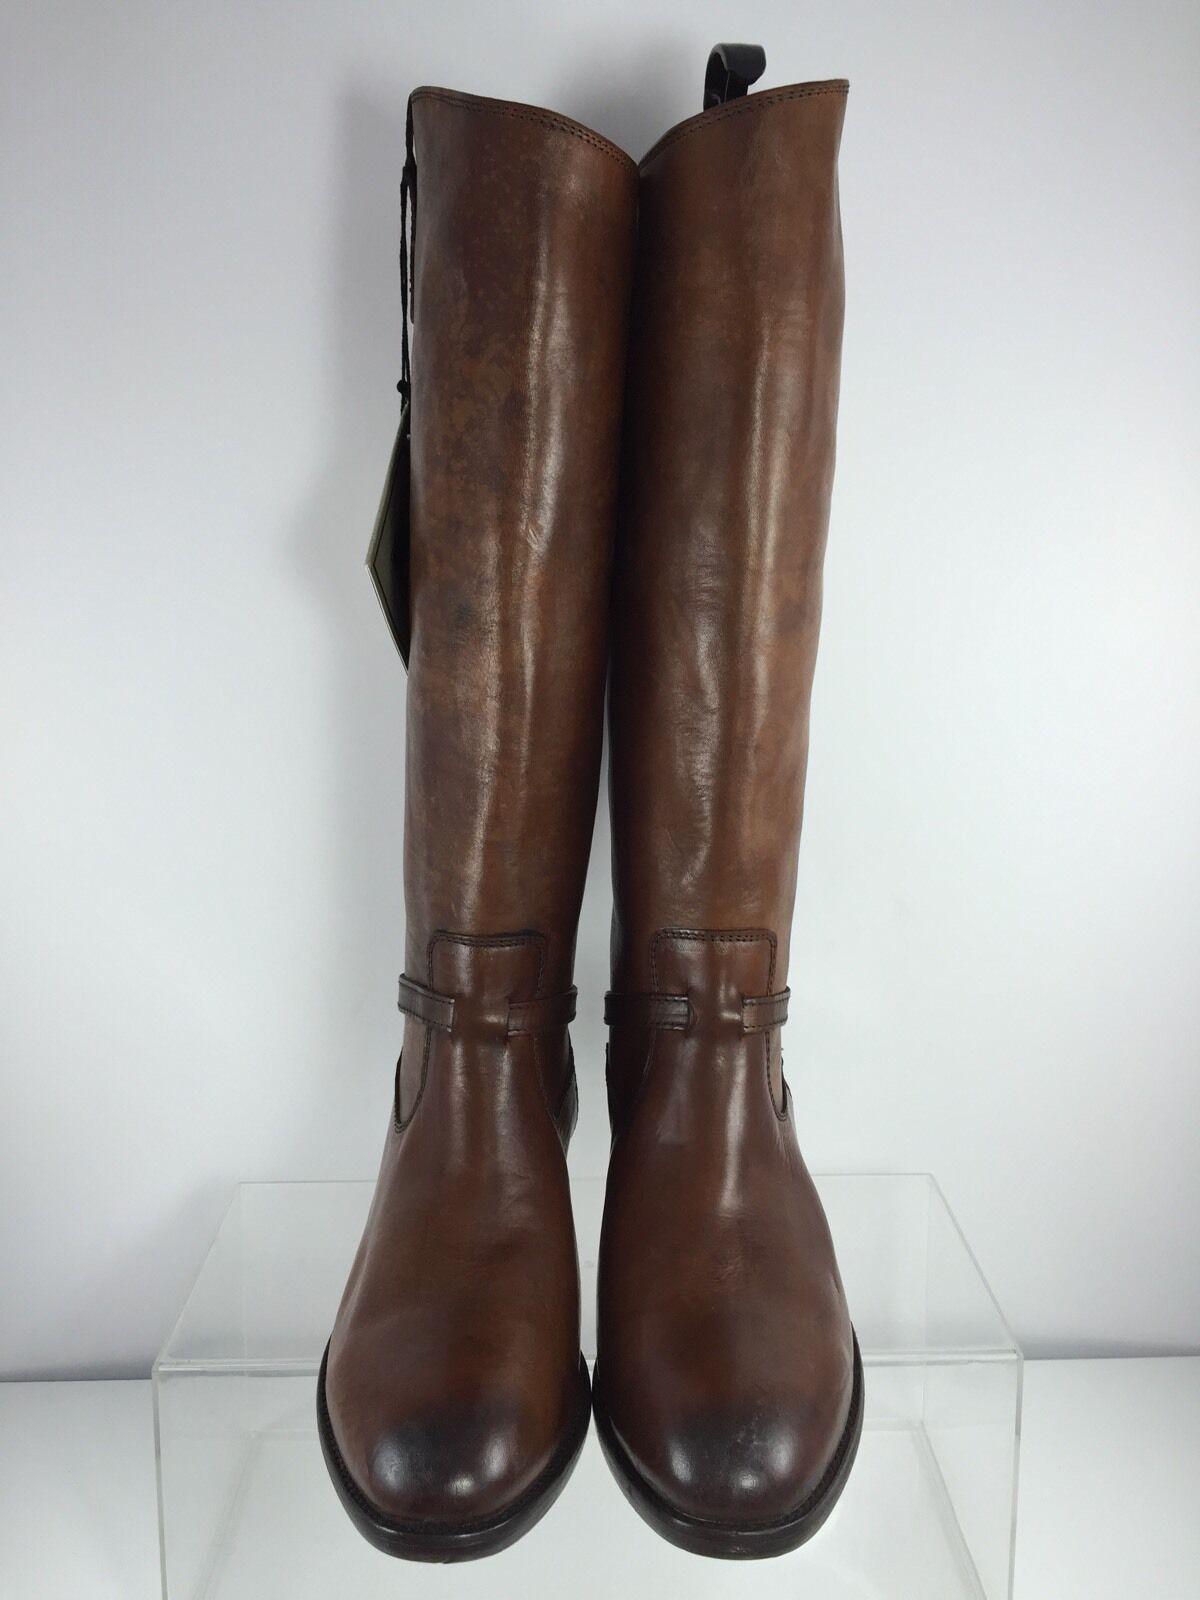 Frye damen damen damen braun Leather Knee Stiefel 9 B 9c152a